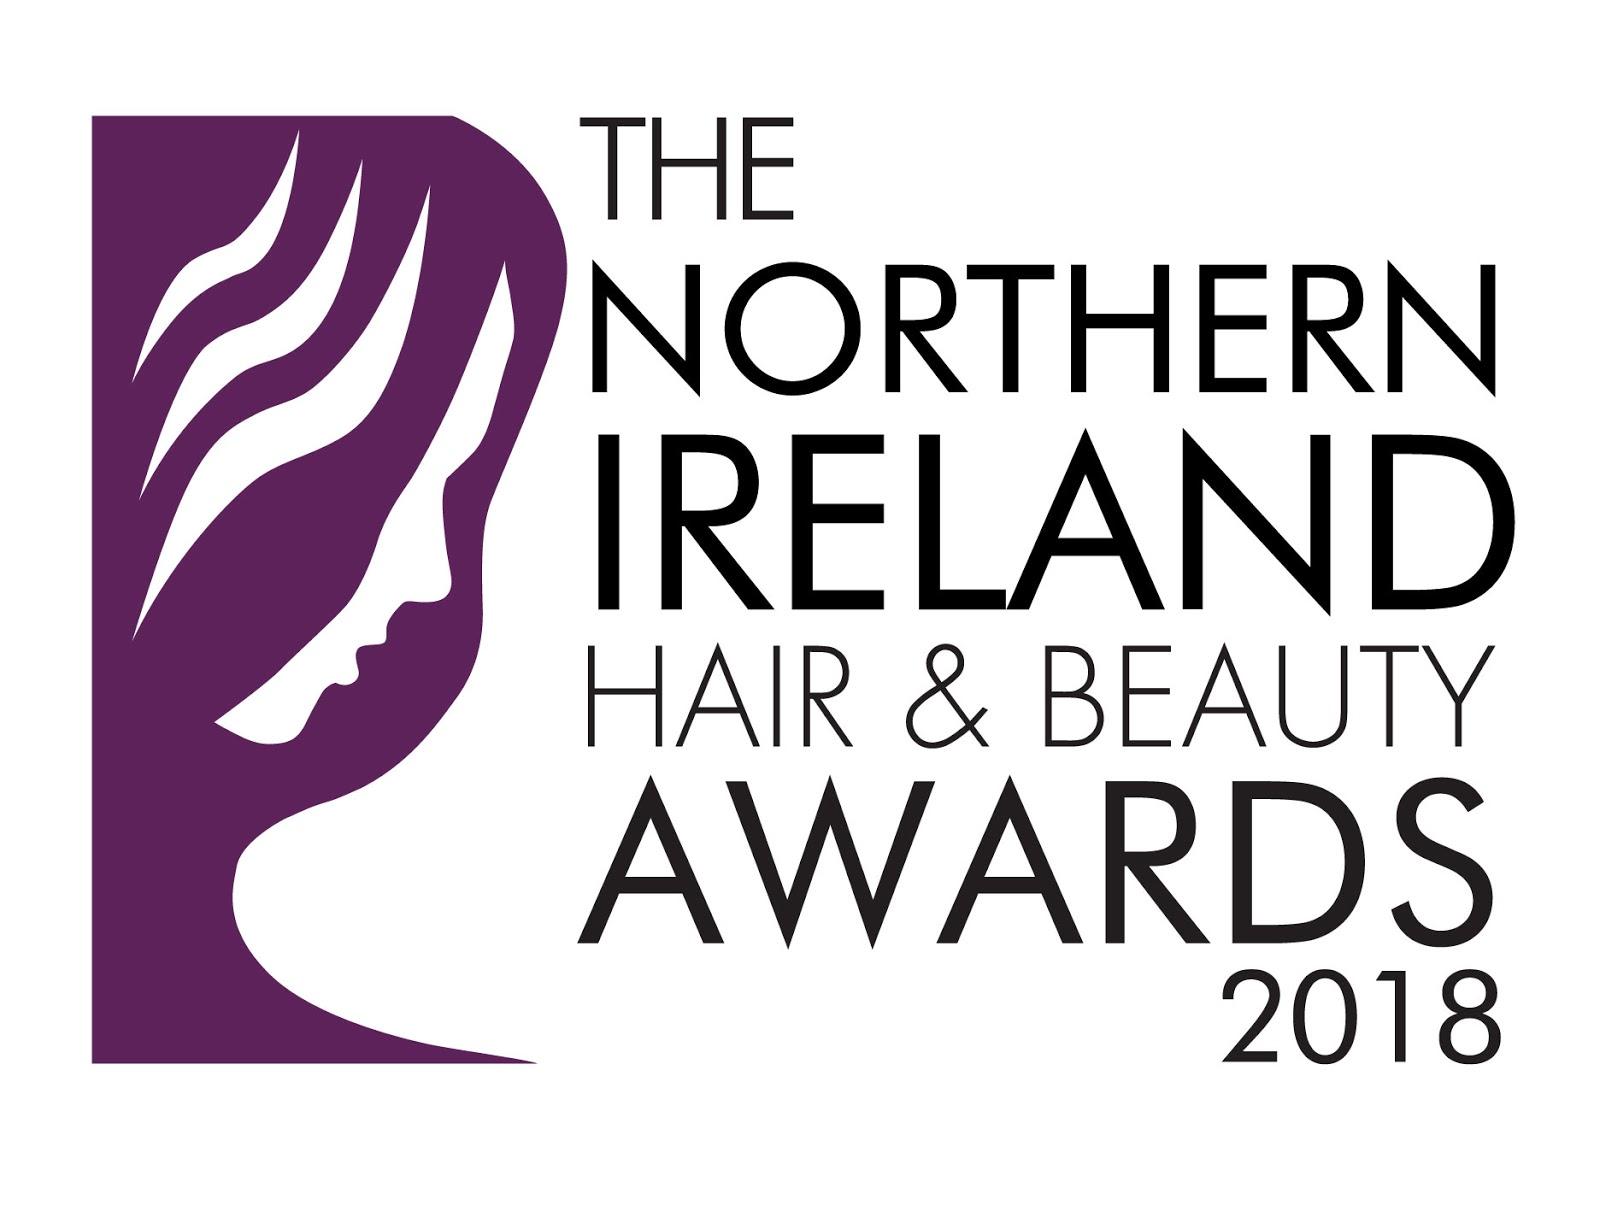 The Northern Ireland Hair Beauty Awards Honour Stars Of Jill Lip Matte 13 Purplish Plum Industry